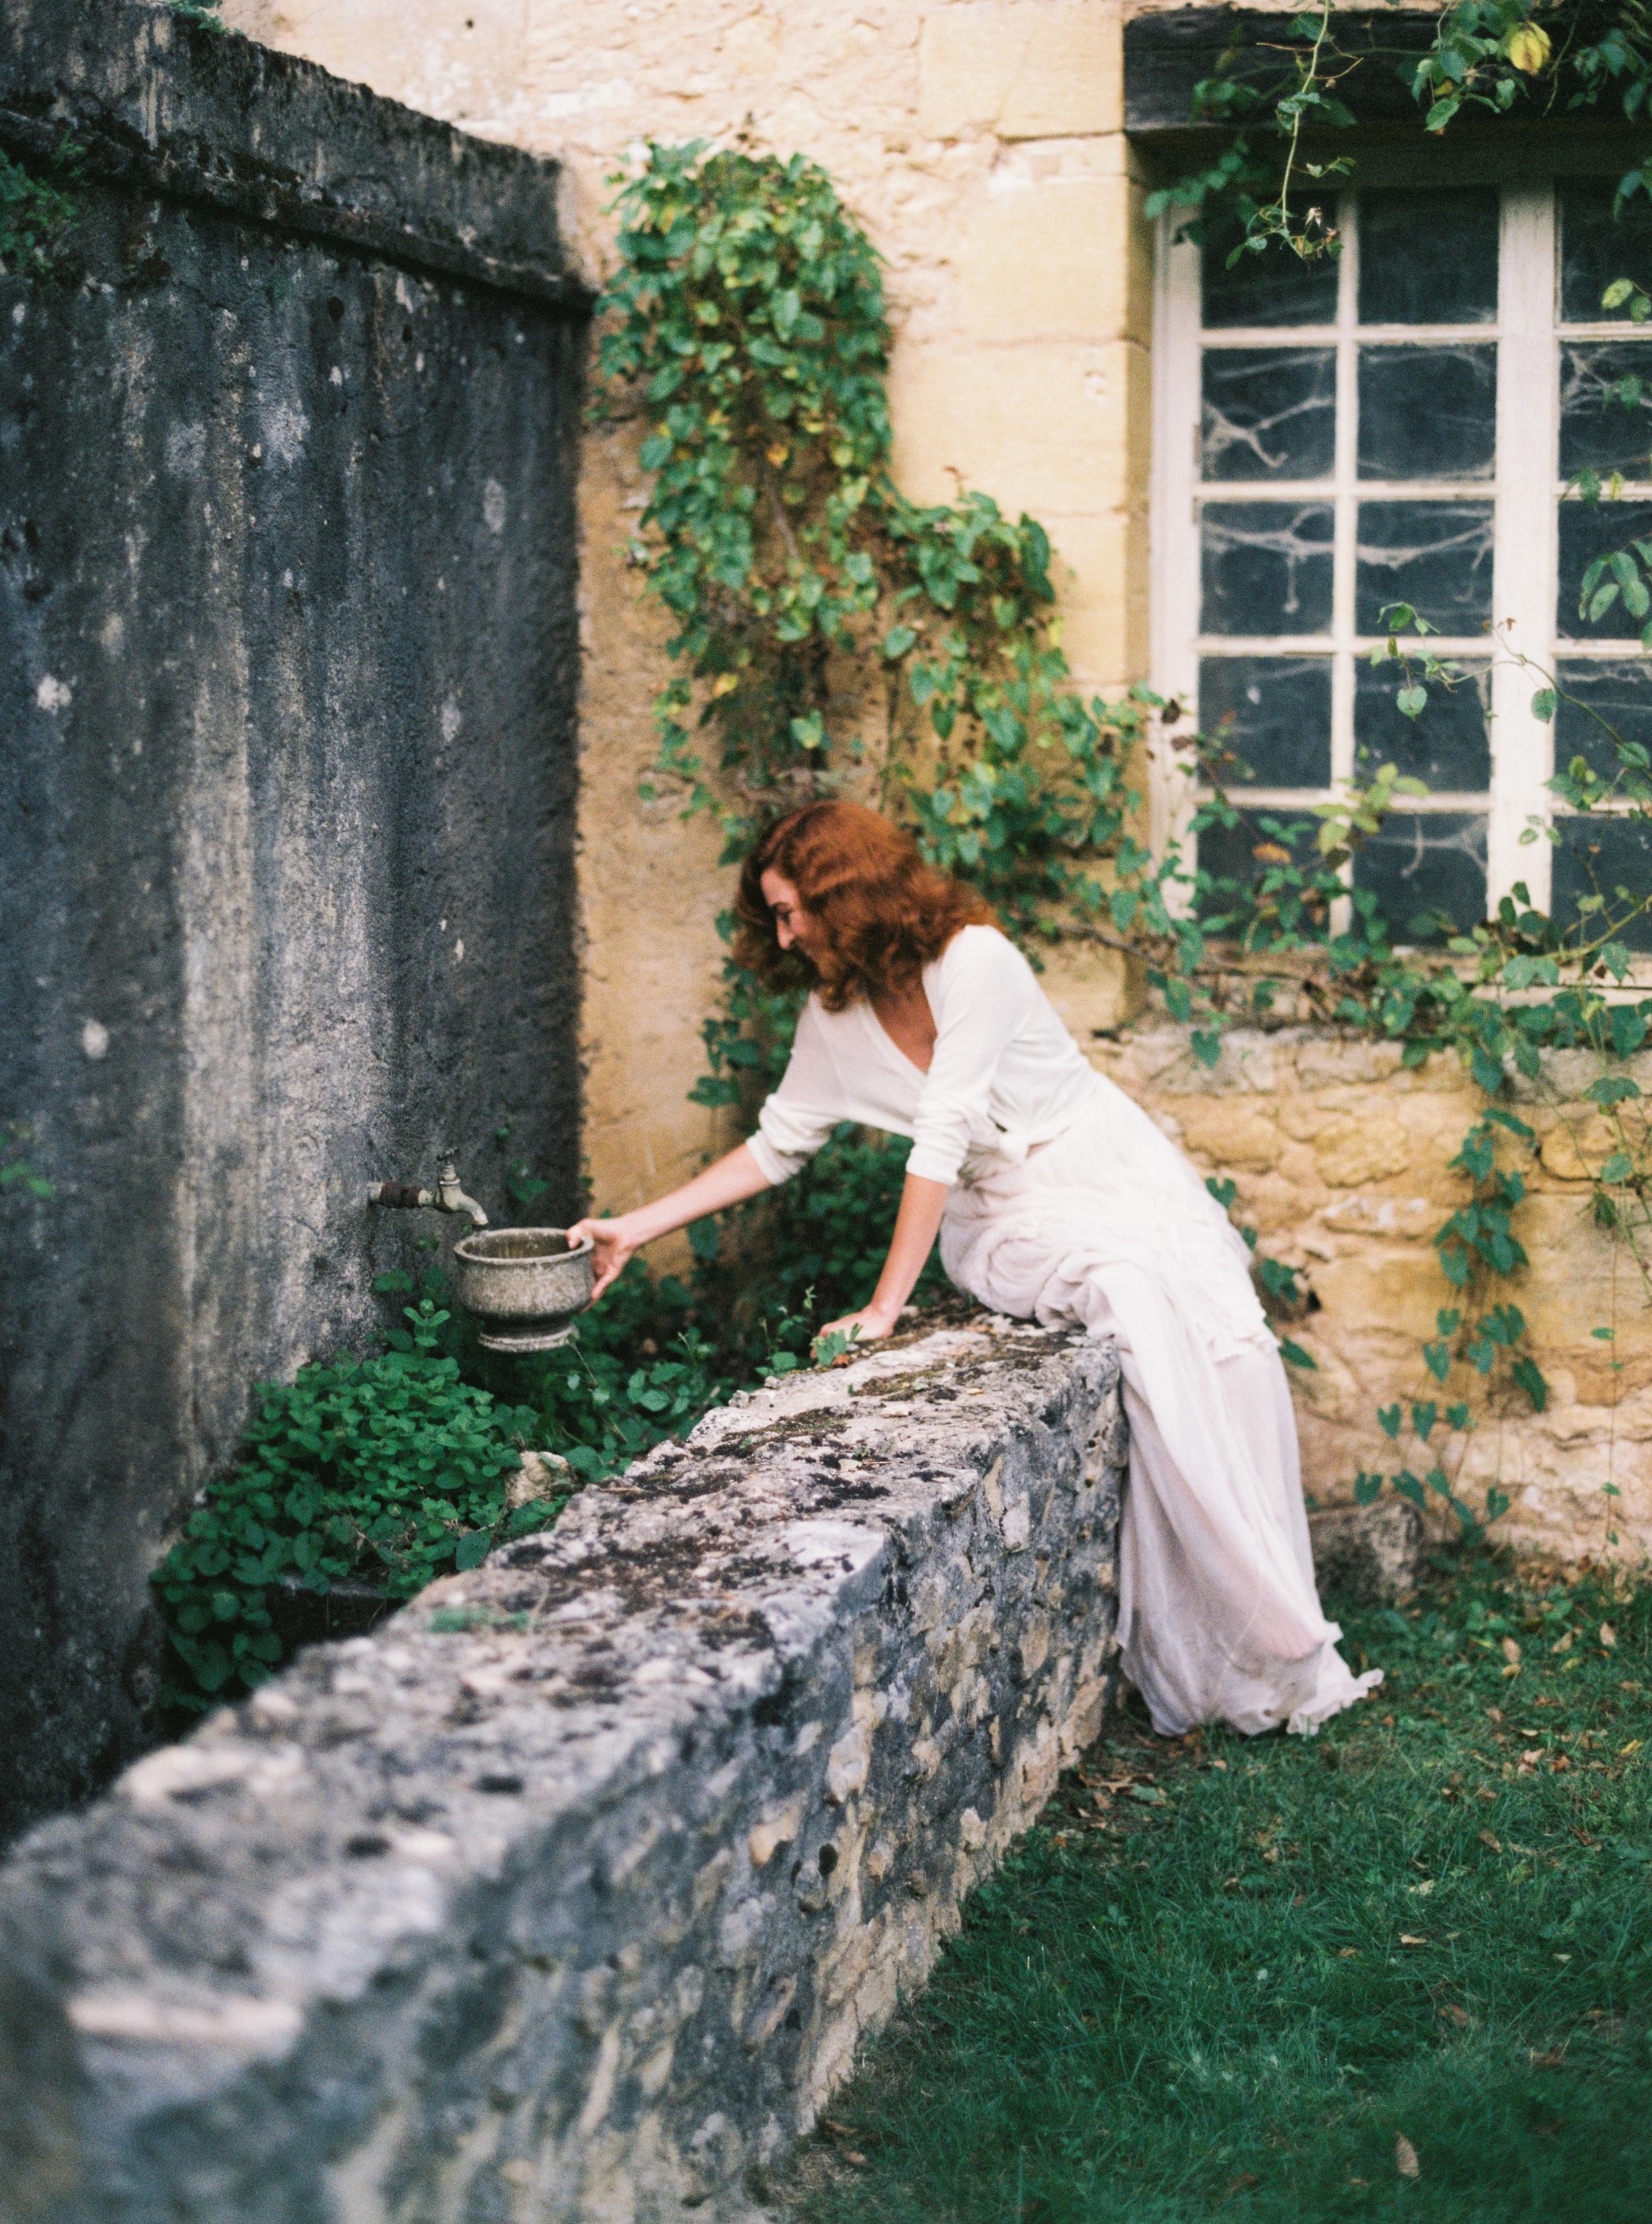 Photo by Tamara Gigola. European Workshop by Ginny Au. Inspirational bridal shoot. Dress by Gossamer Vintage. France. Dordogne.